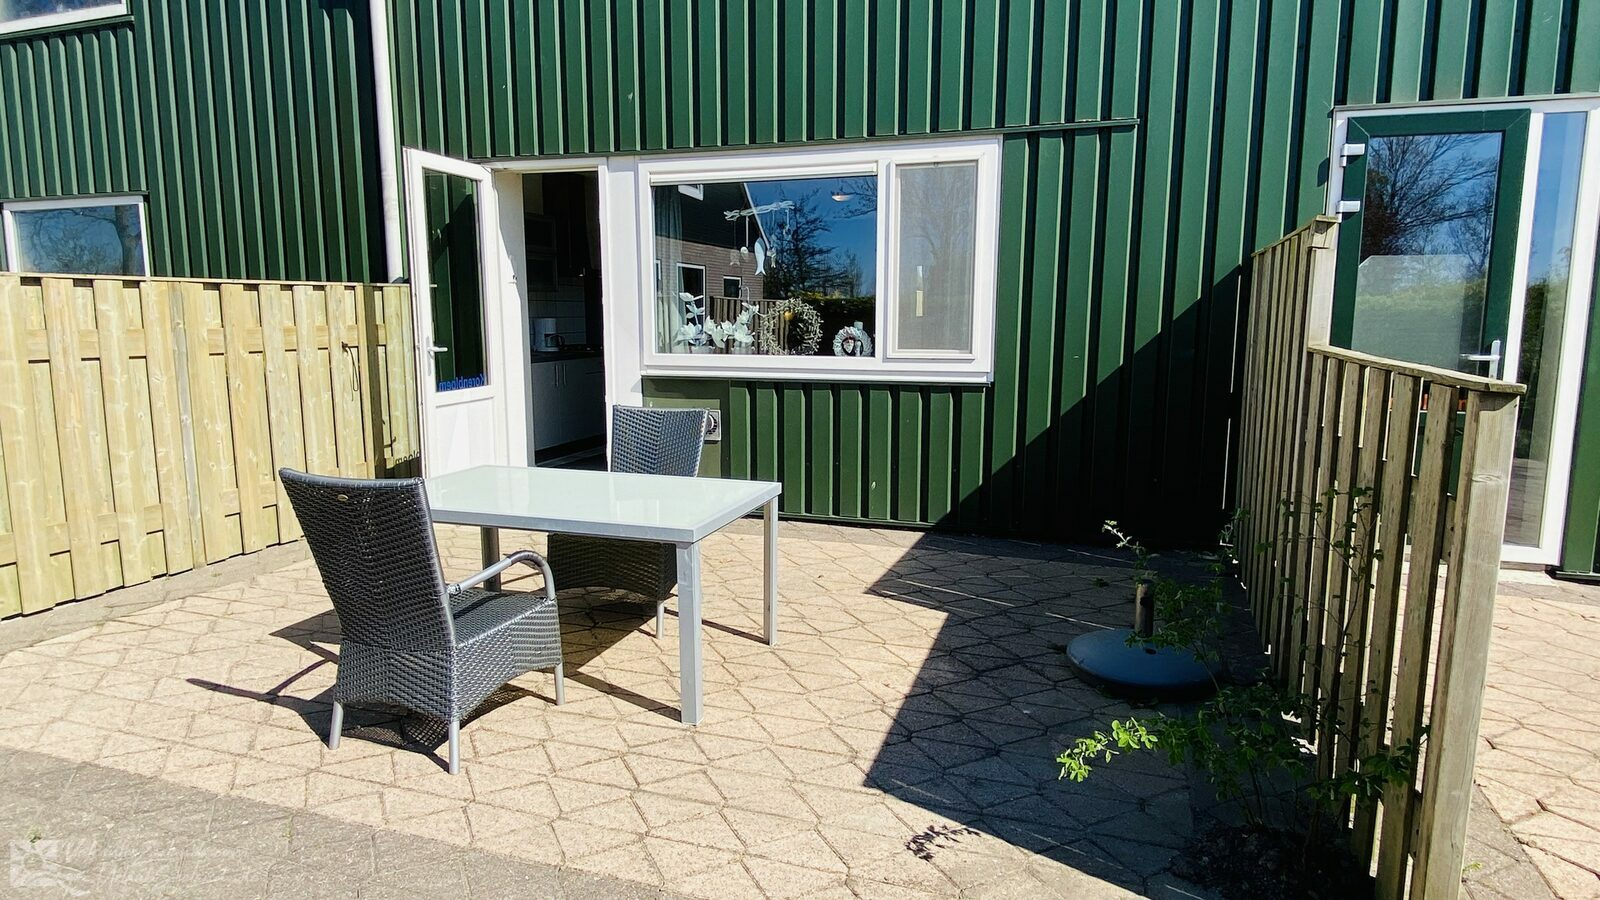 VZ176 Studio Apartment Vrouwenpolder